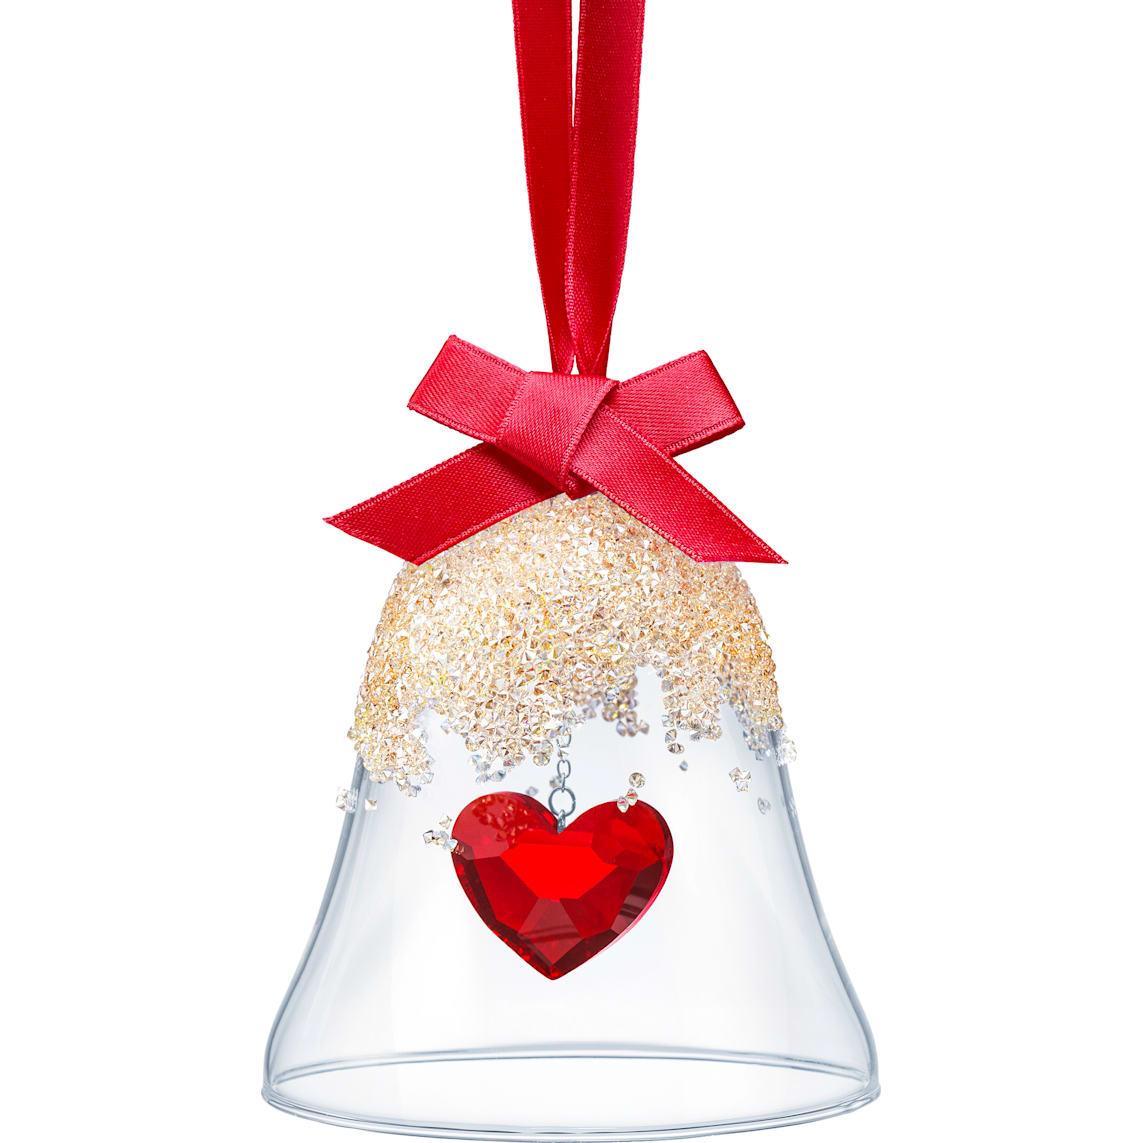 Christmas Bell.Christmas Bell Ornament Heart